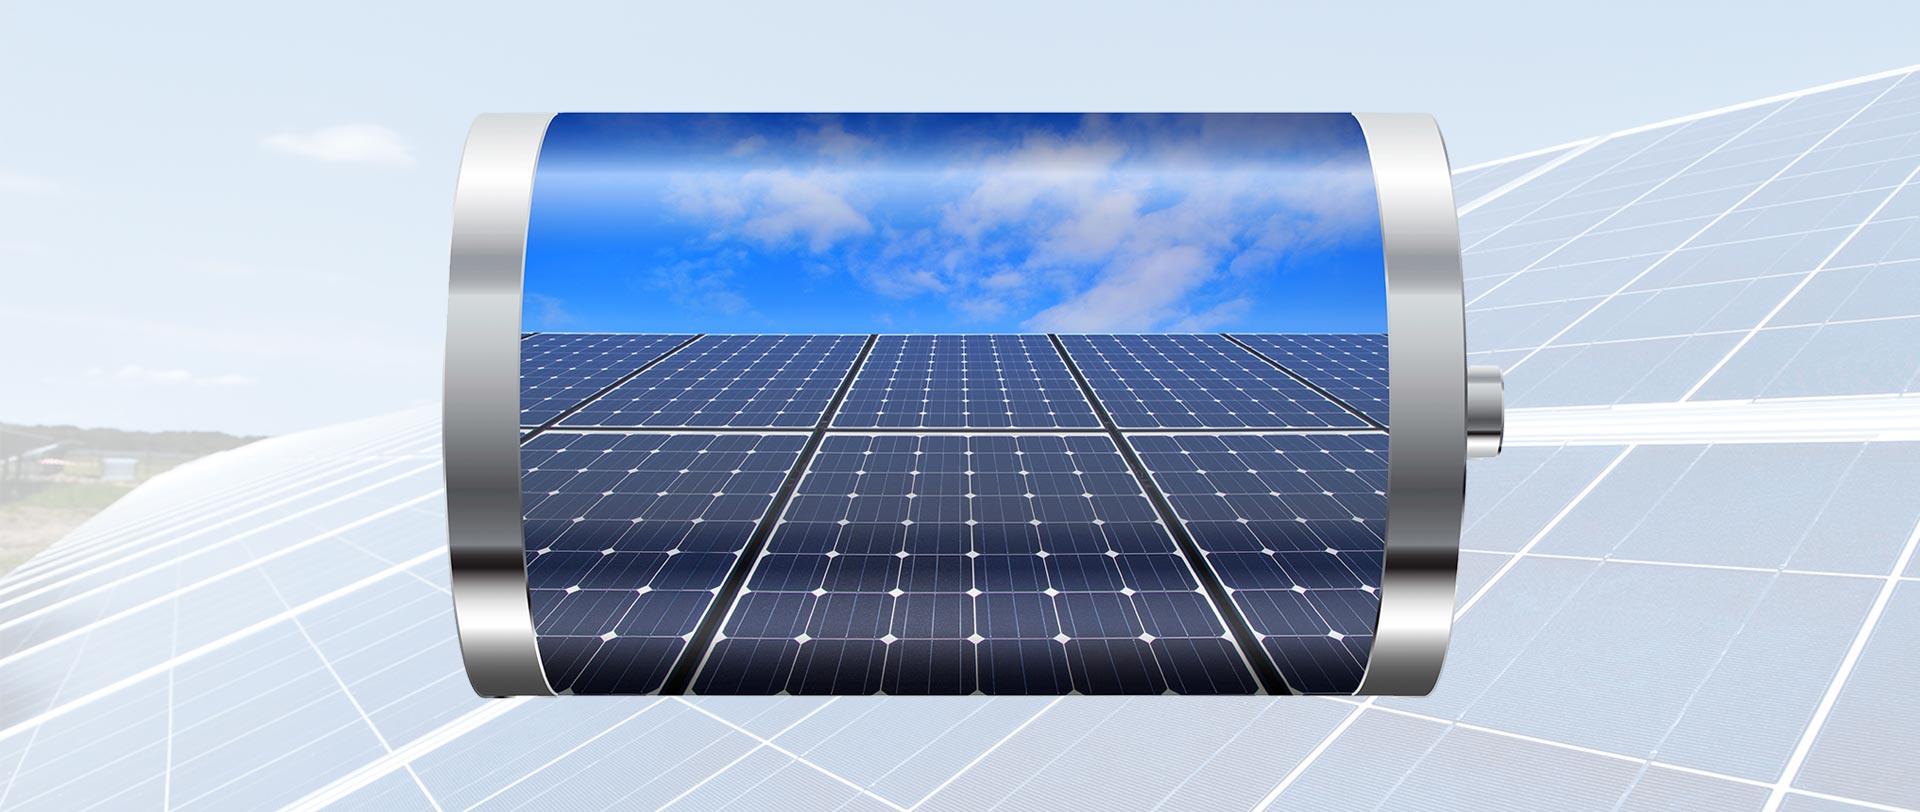 econ solarwind photovoltaik solaranlage stromspeicher. Black Bedroom Furniture Sets. Home Design Ideas